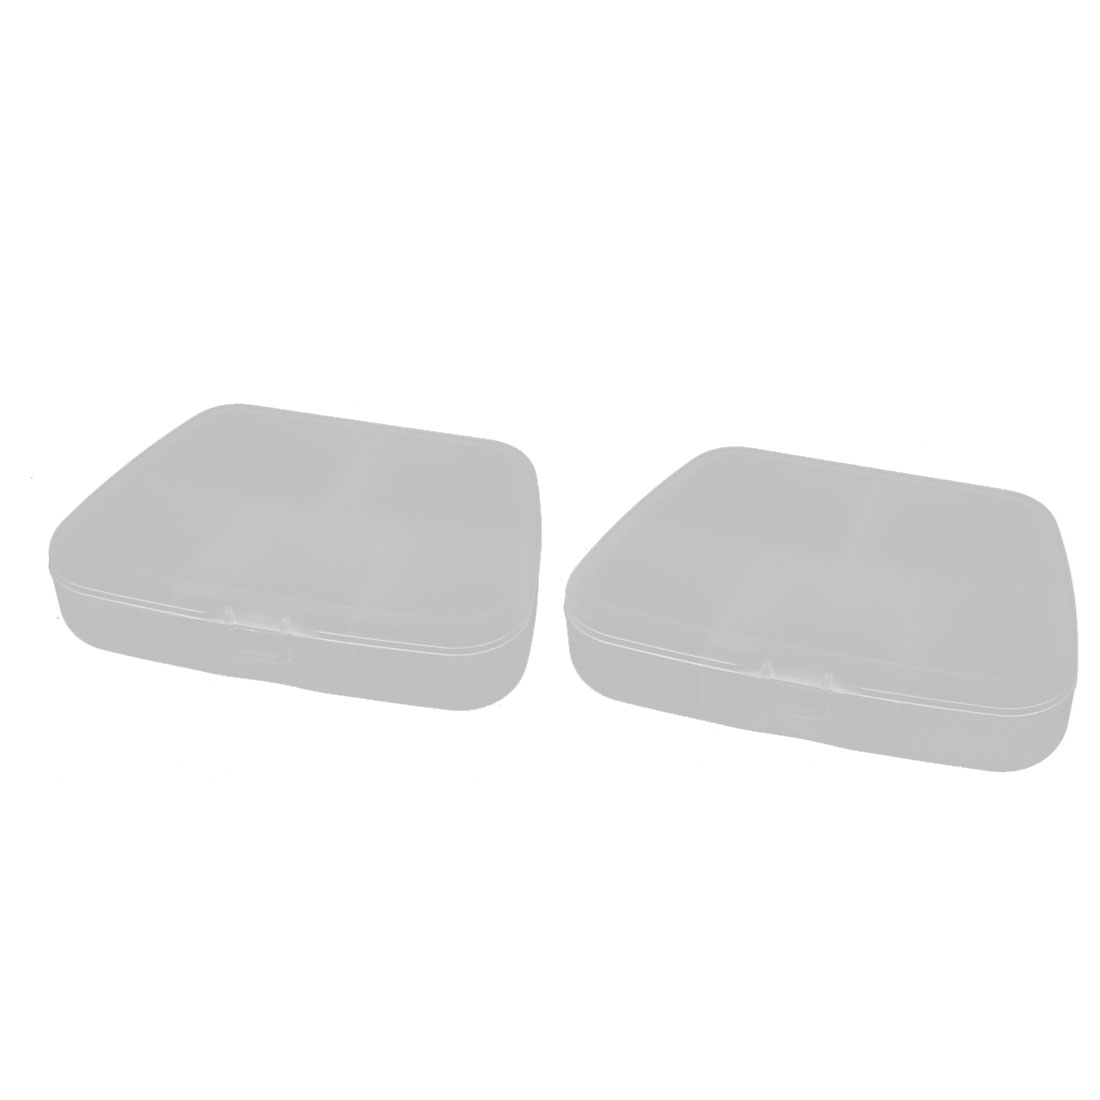 Plastic 5 Compartments Pill Tablet Gadget Storage Box Case Clear 2PCS